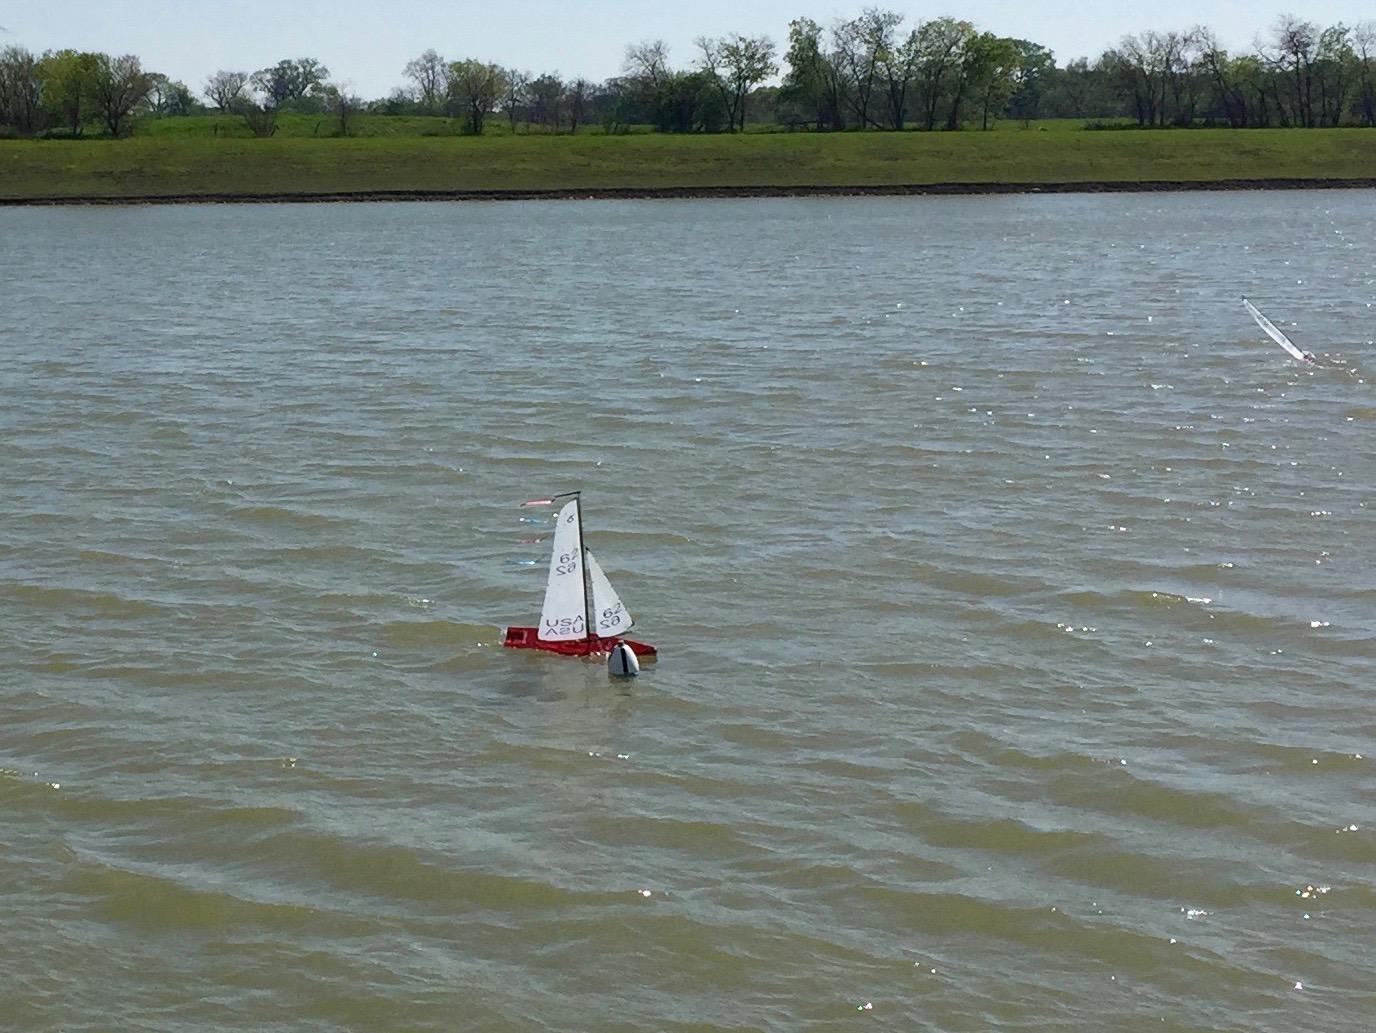 Model Yachting